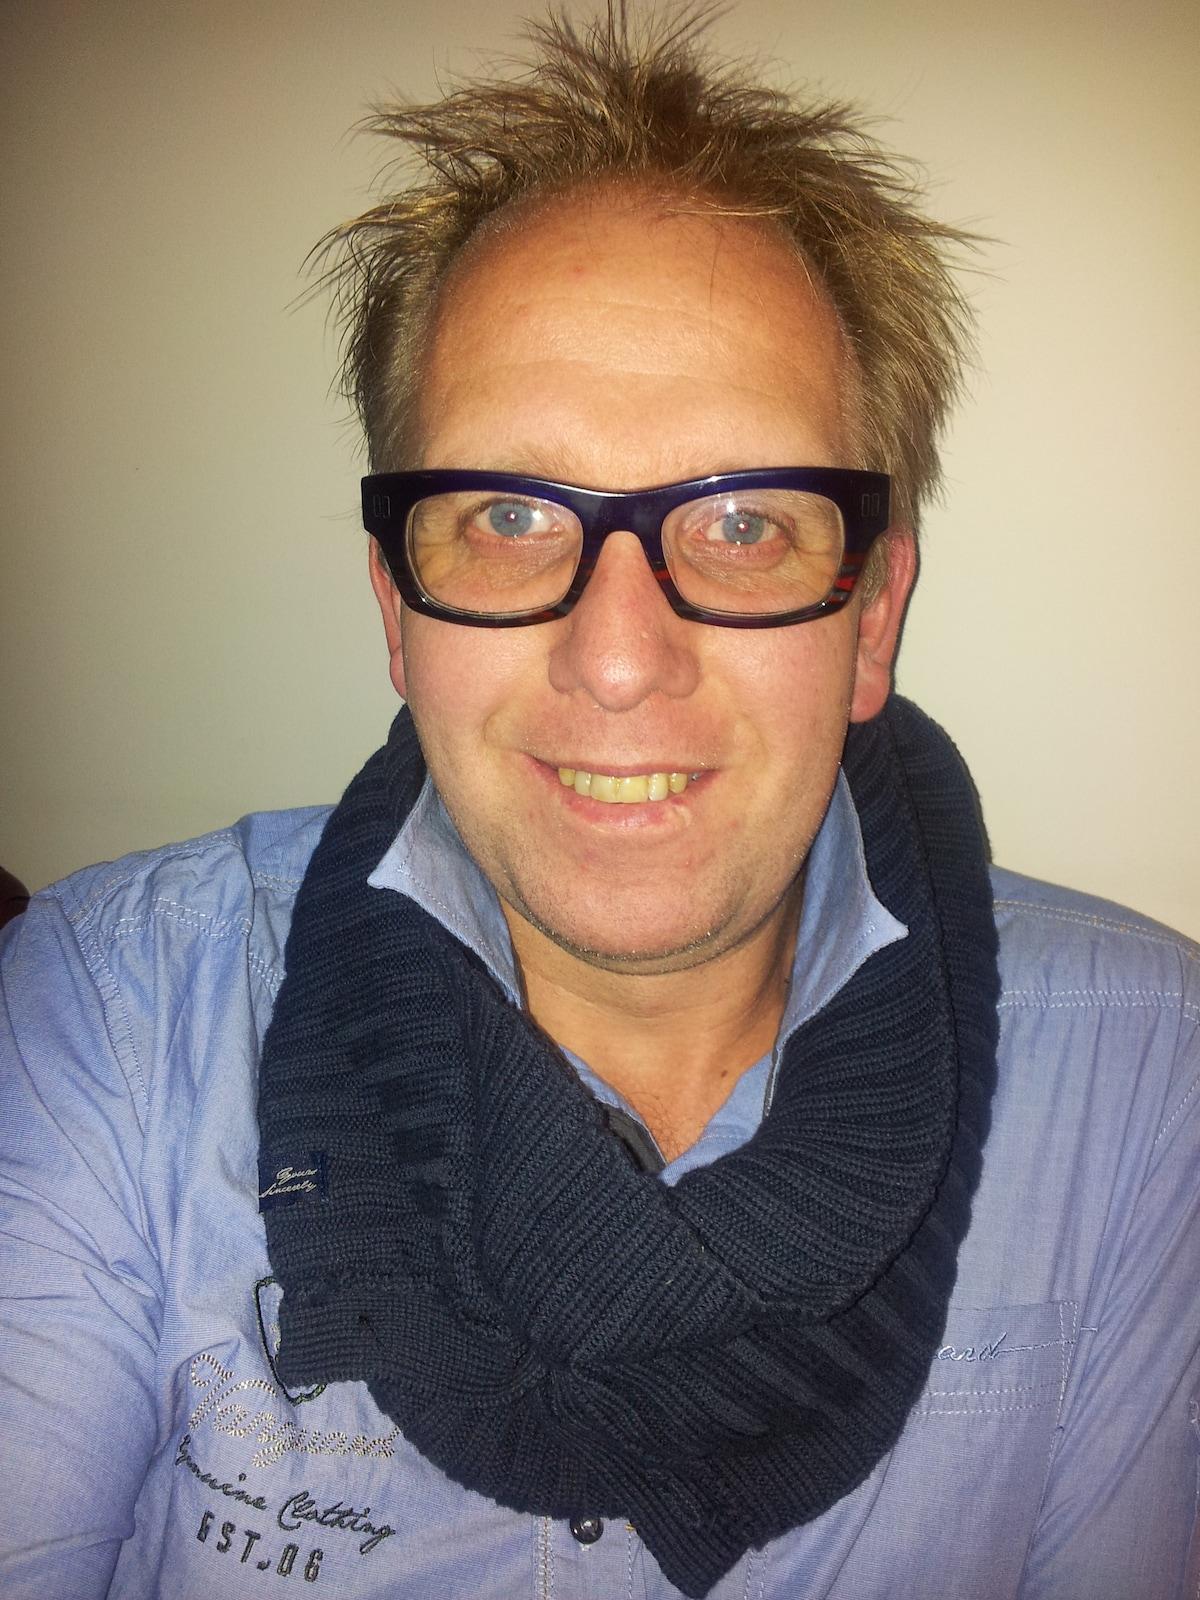 Richard from Nijkerk